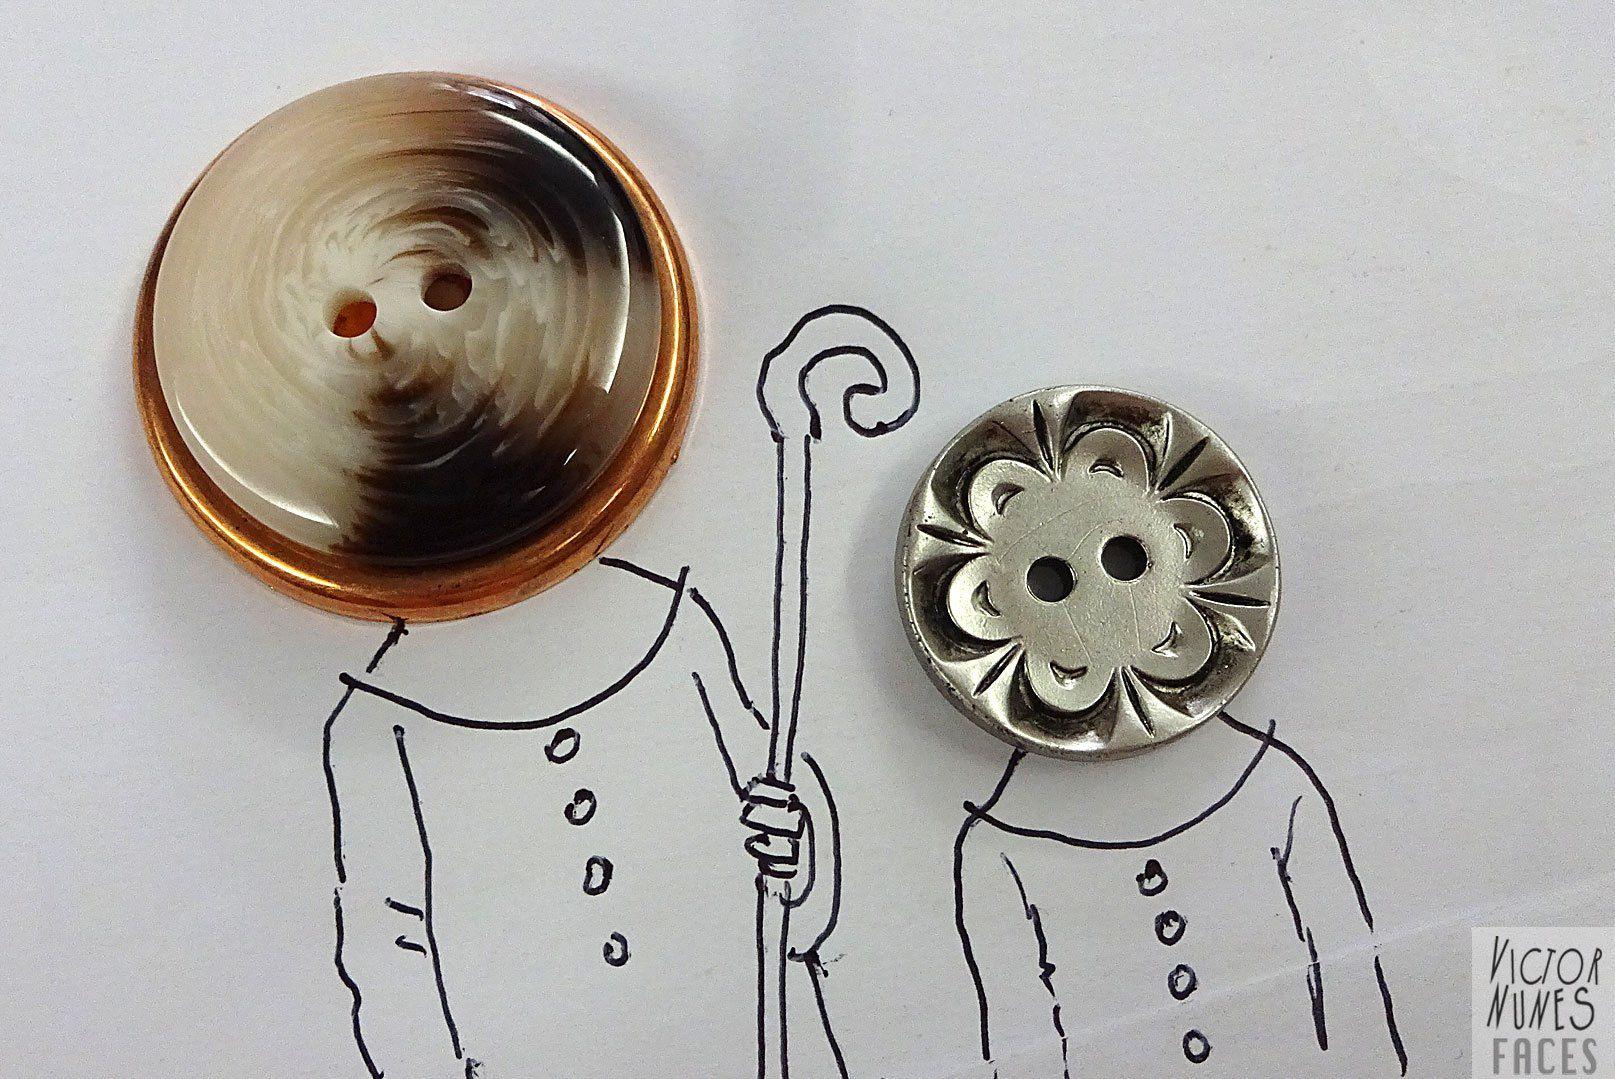 objetos con ilustracion oldskull 1